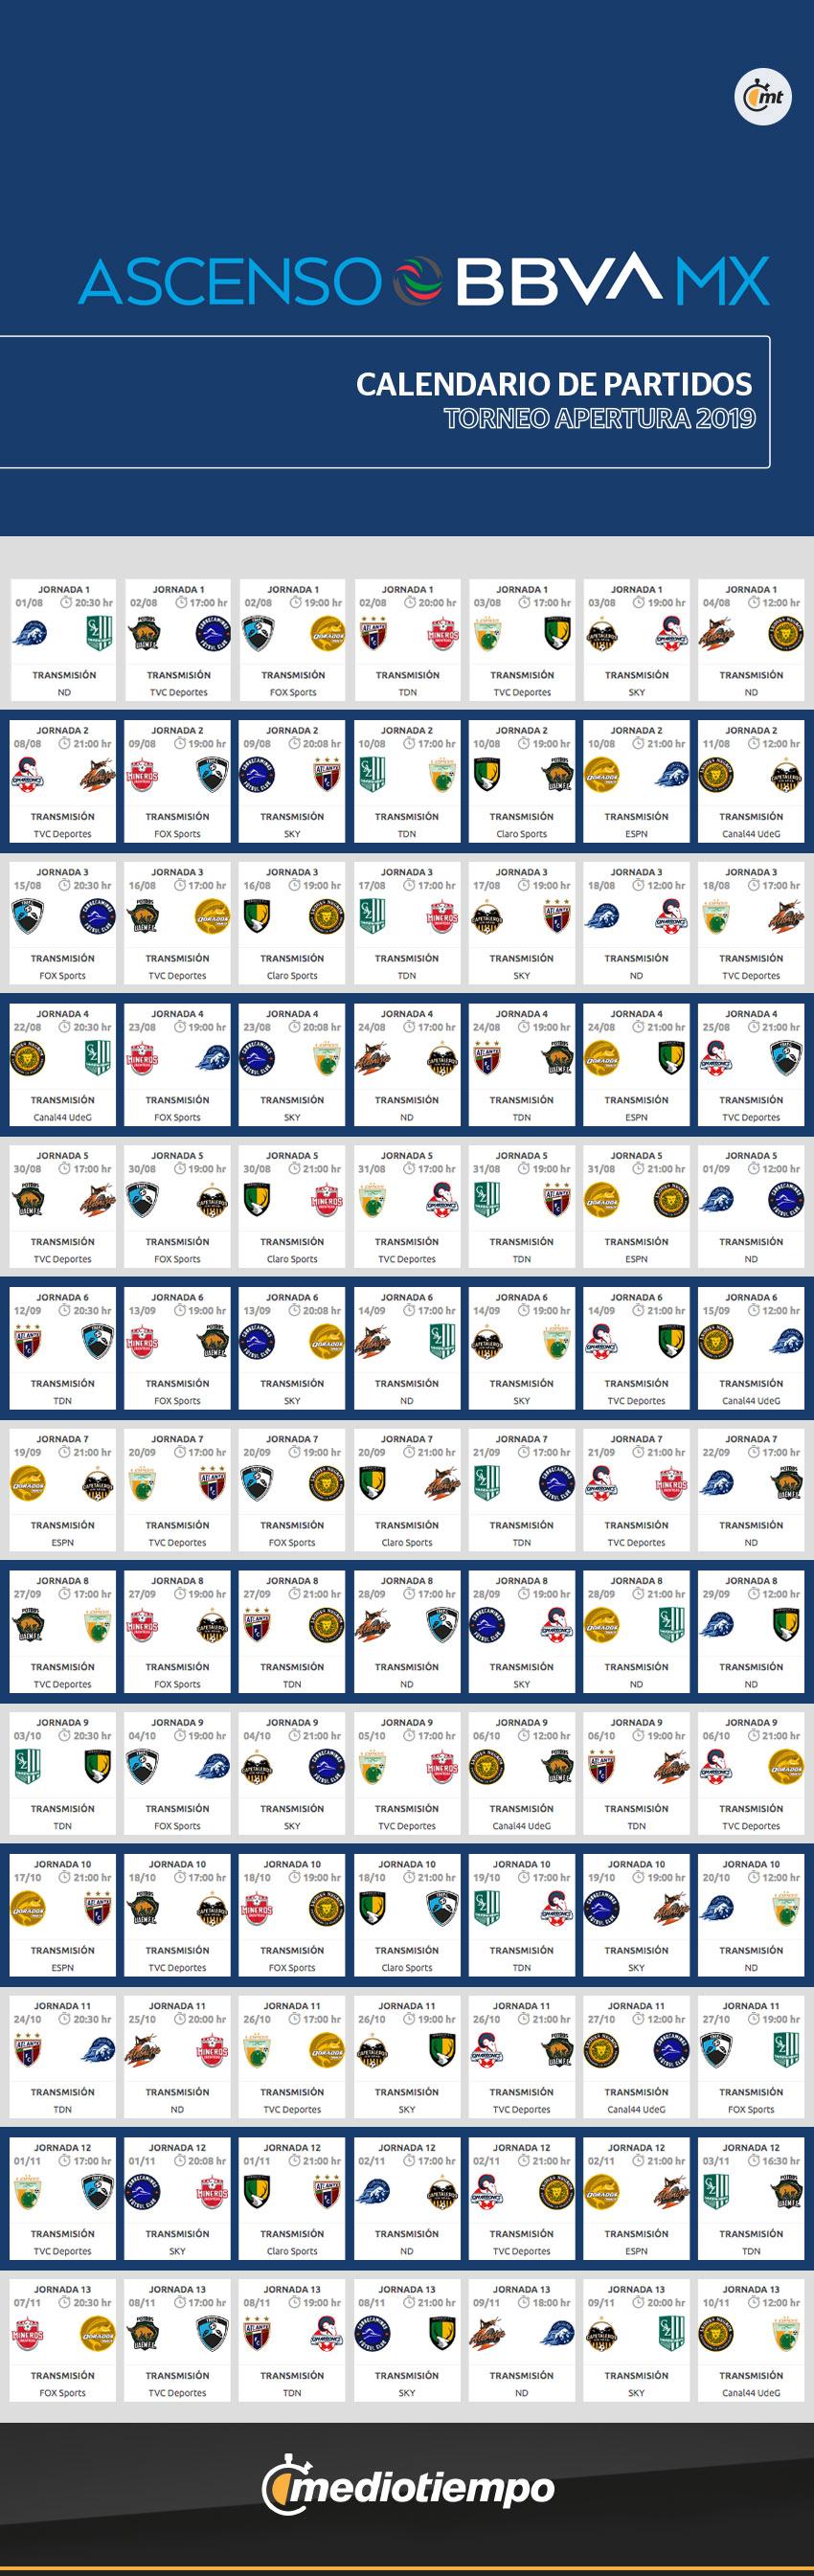 Liga Bbva Calendario 2019.Ascenso Mx Calendario Completo Del Apertura 2019 Partidos Y